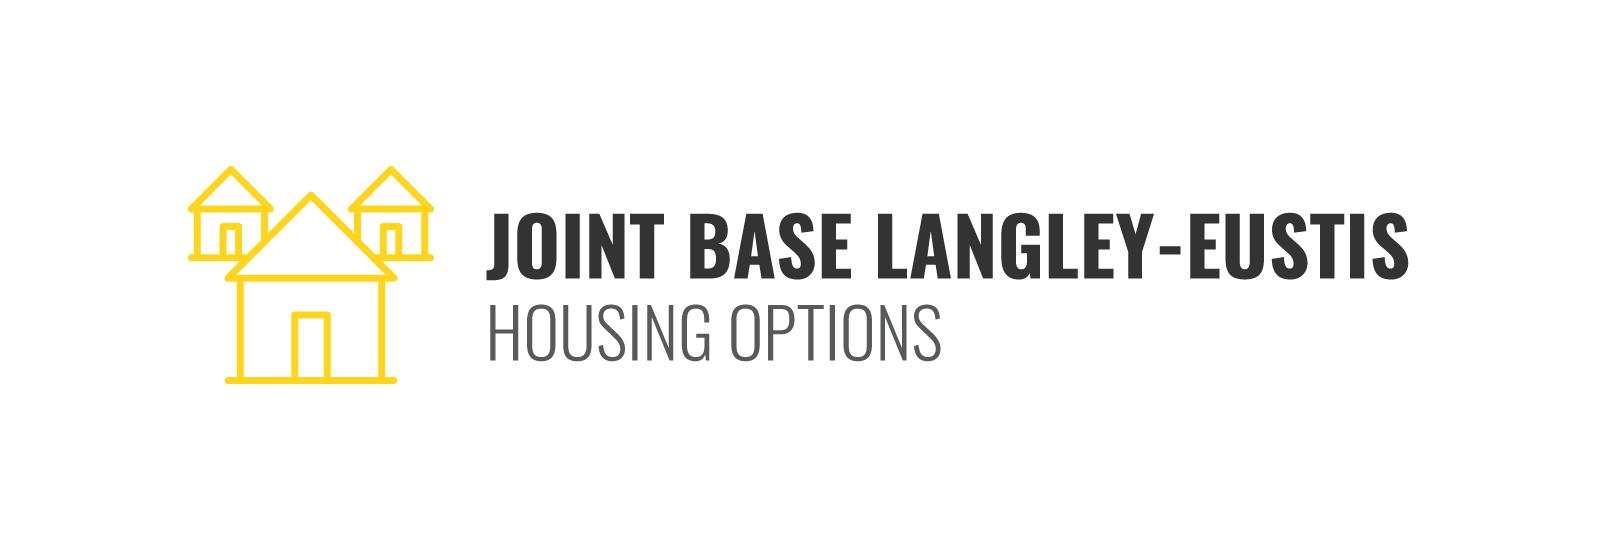 Joint Base Langley-Eustis Housing